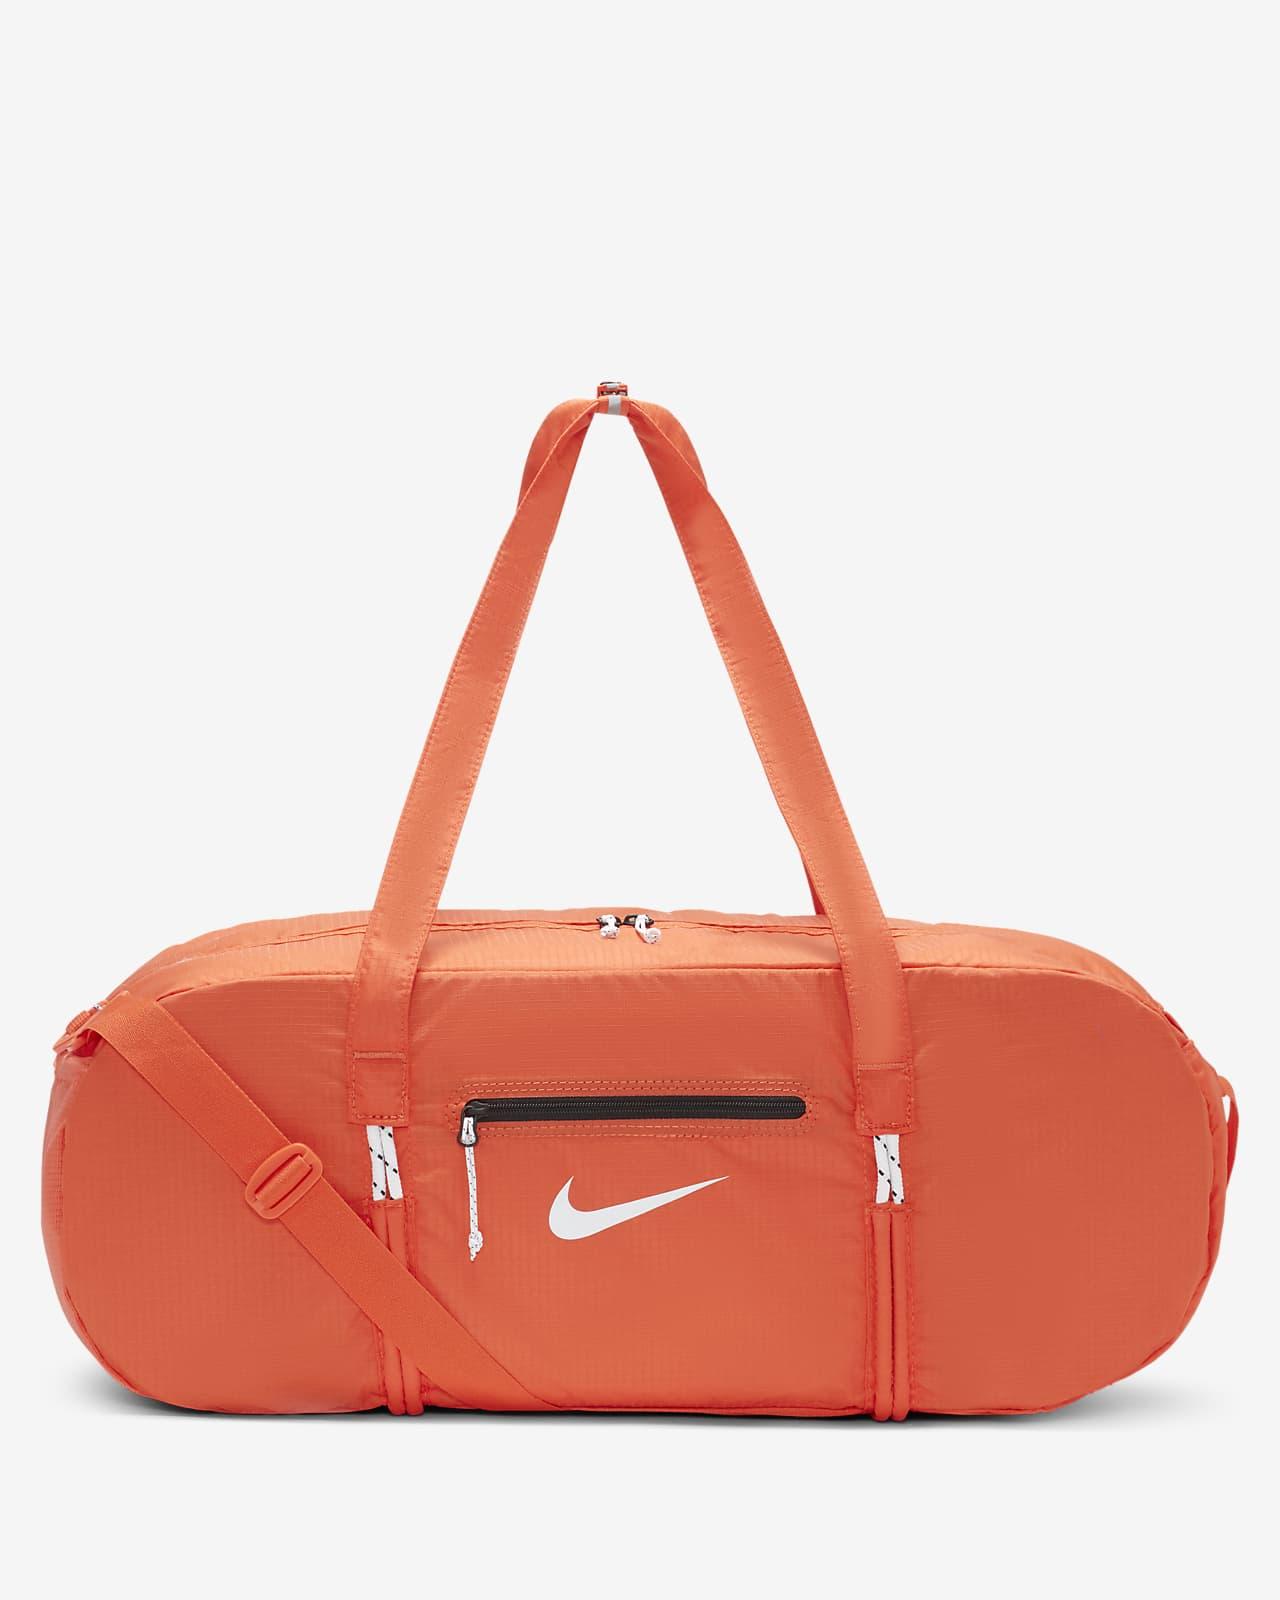 Nike Stash Duffel